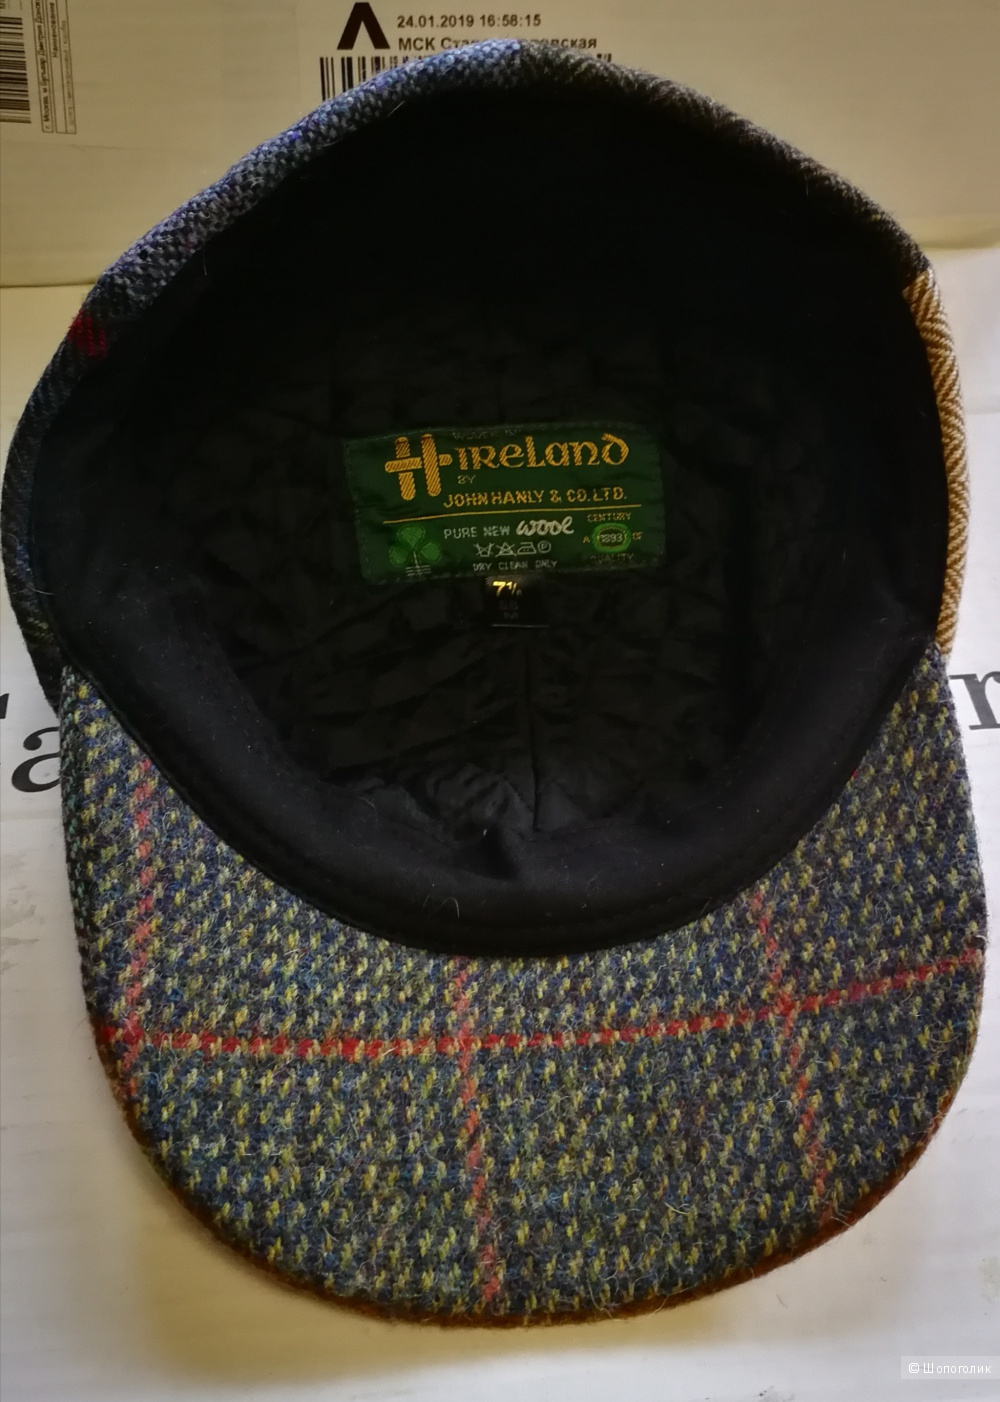 HIRELAND  poor new wool cap, унисекс, размер М, 58